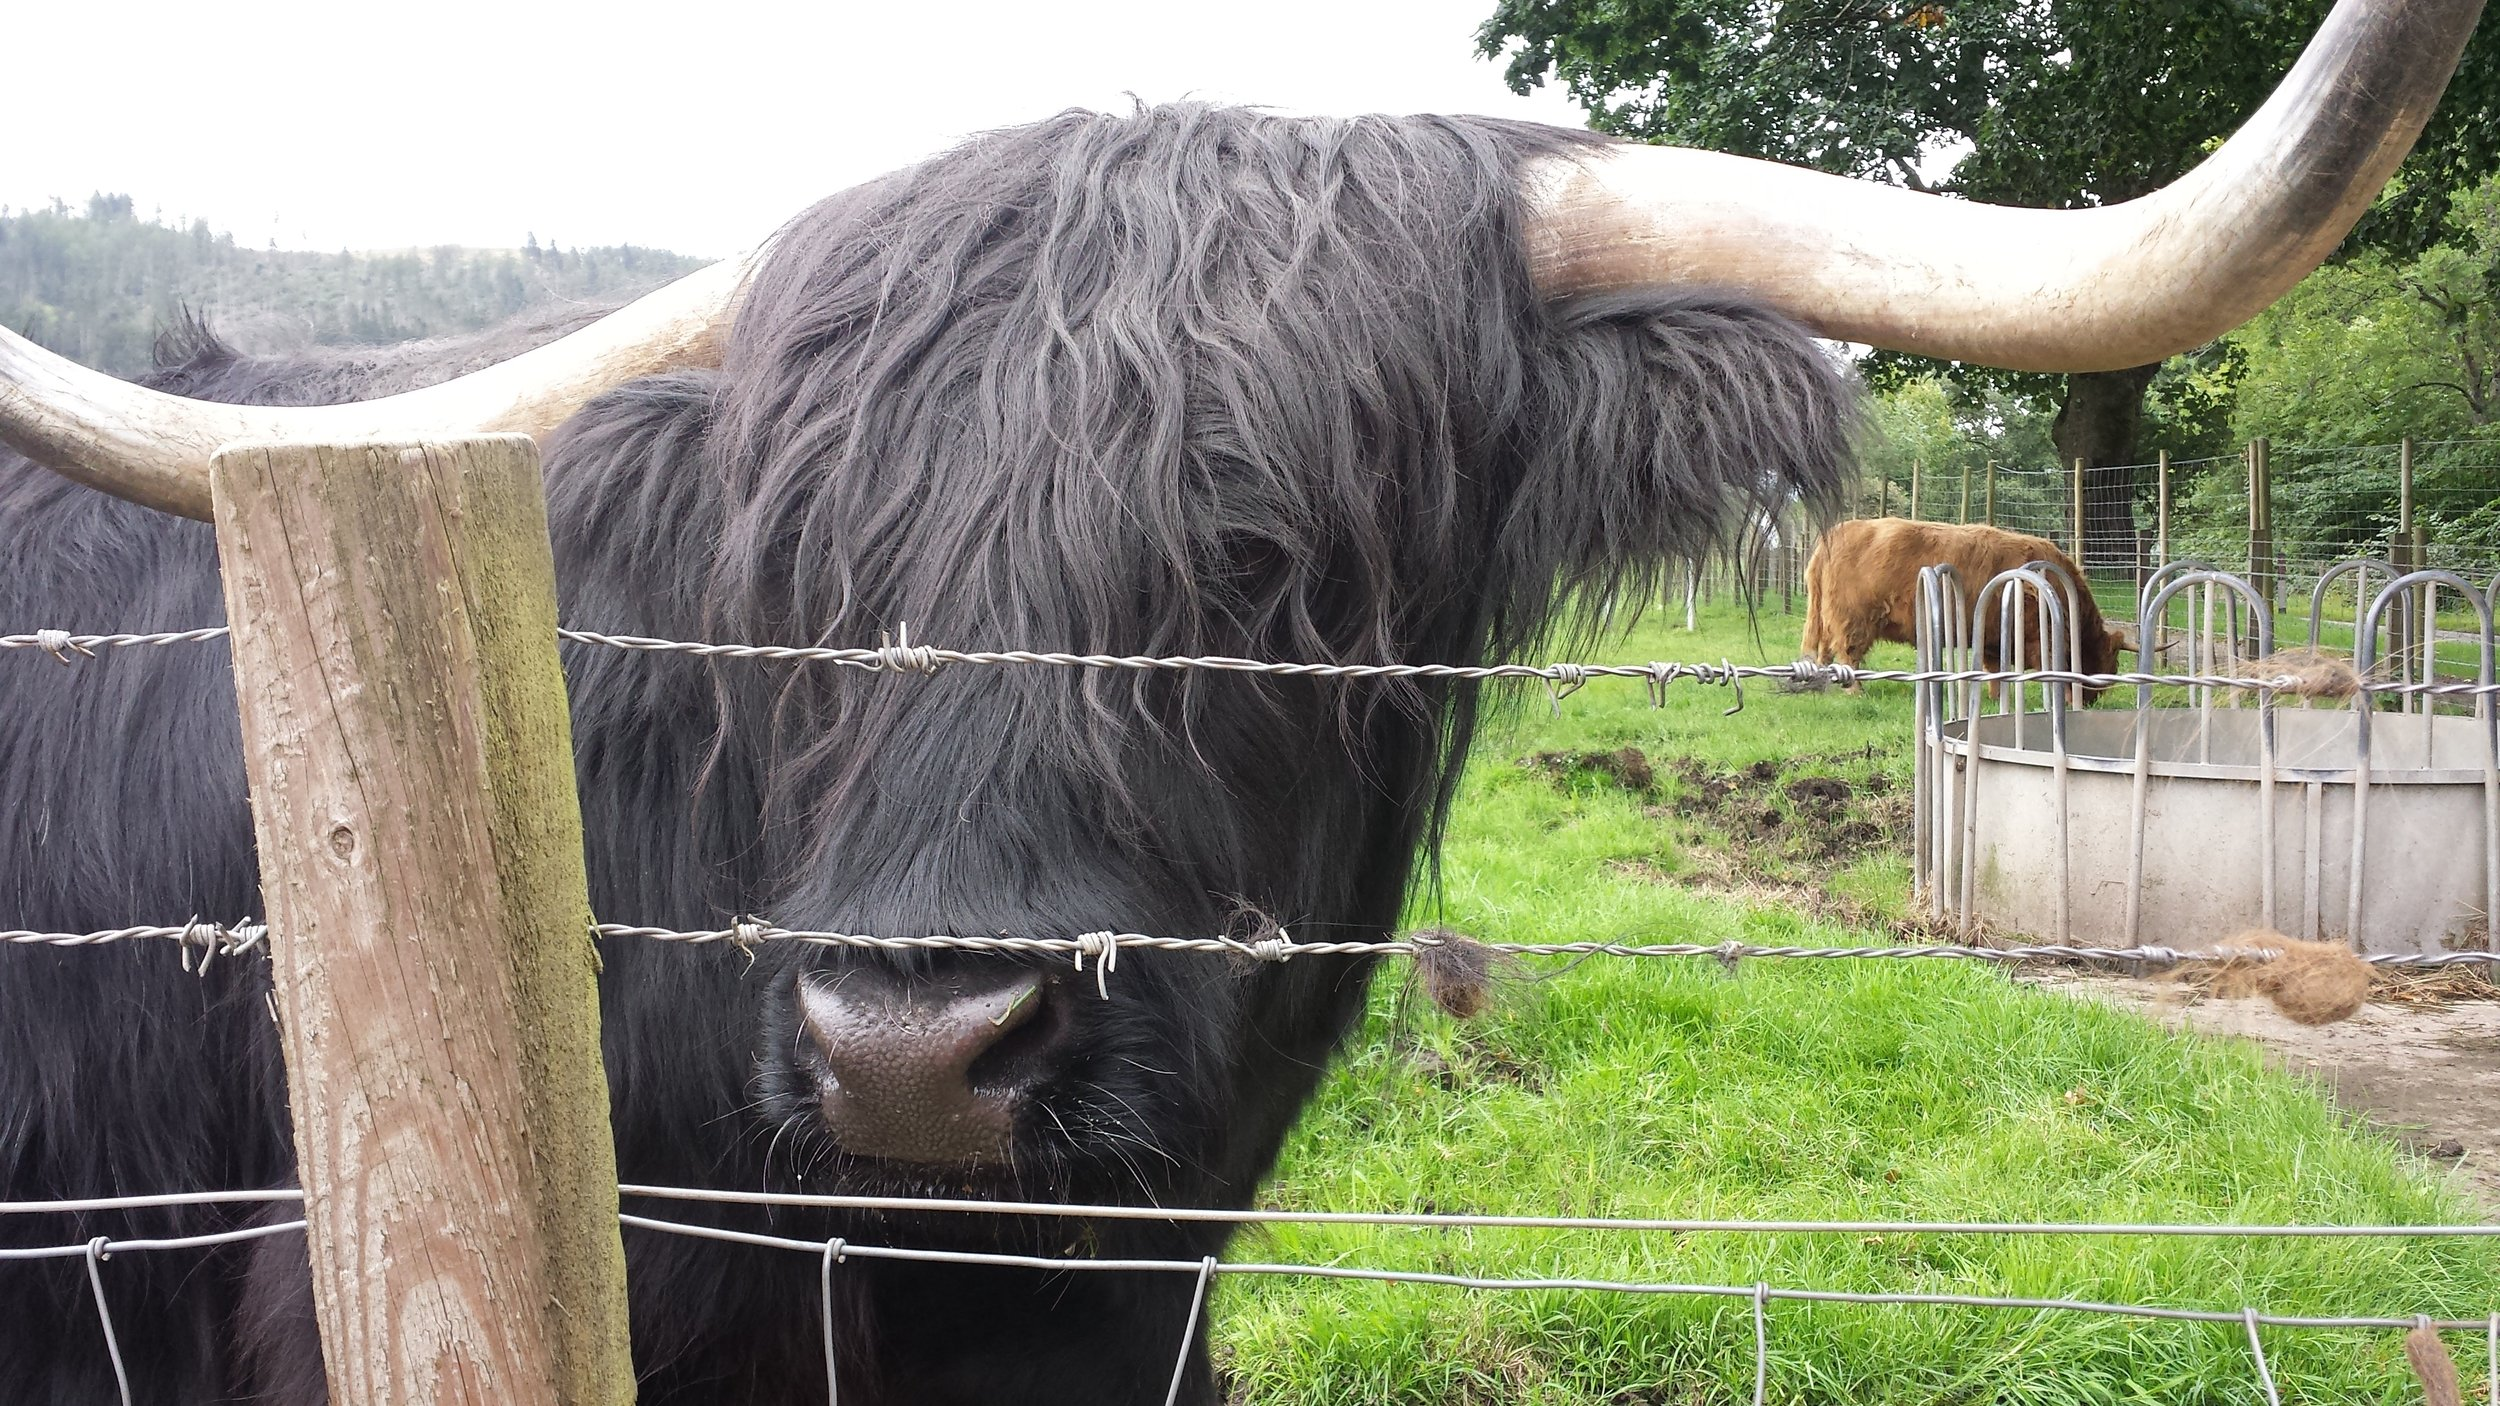 20160901_115959 trossachs highland cow.jpg